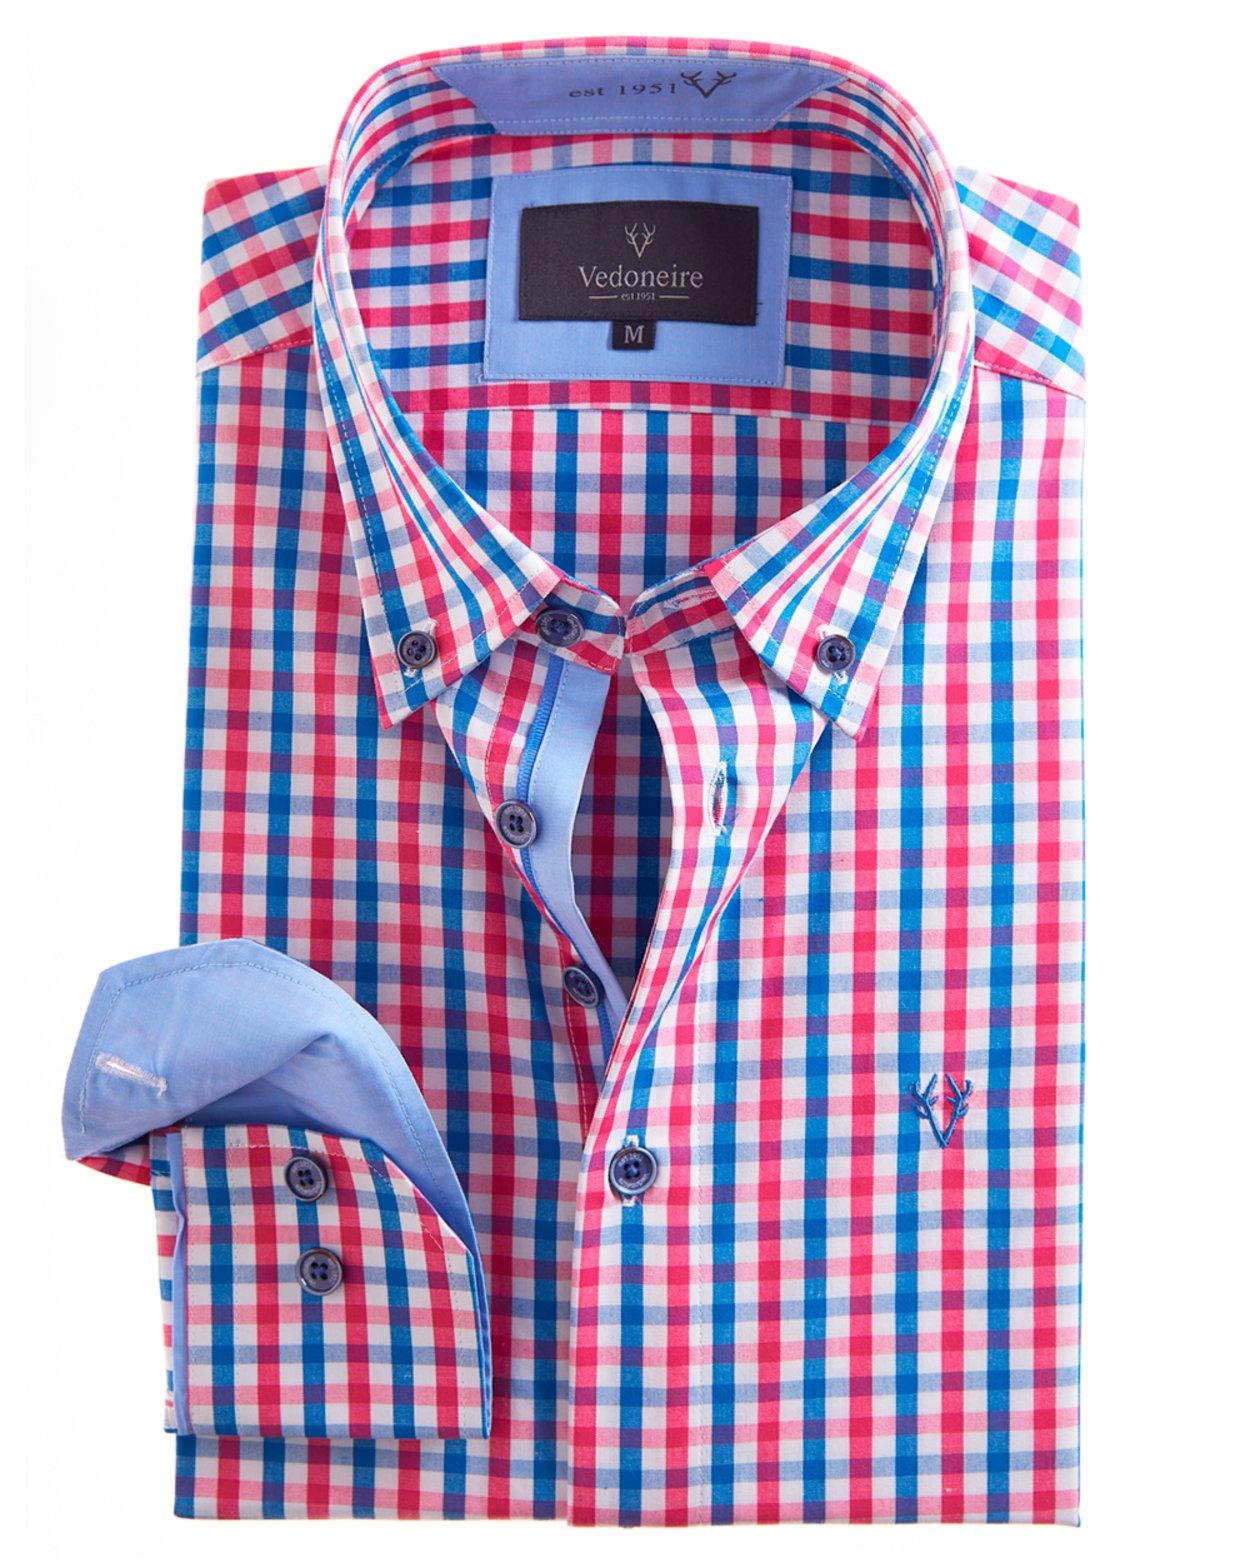 Soft Peach Finish Plaid Cotton Shirt